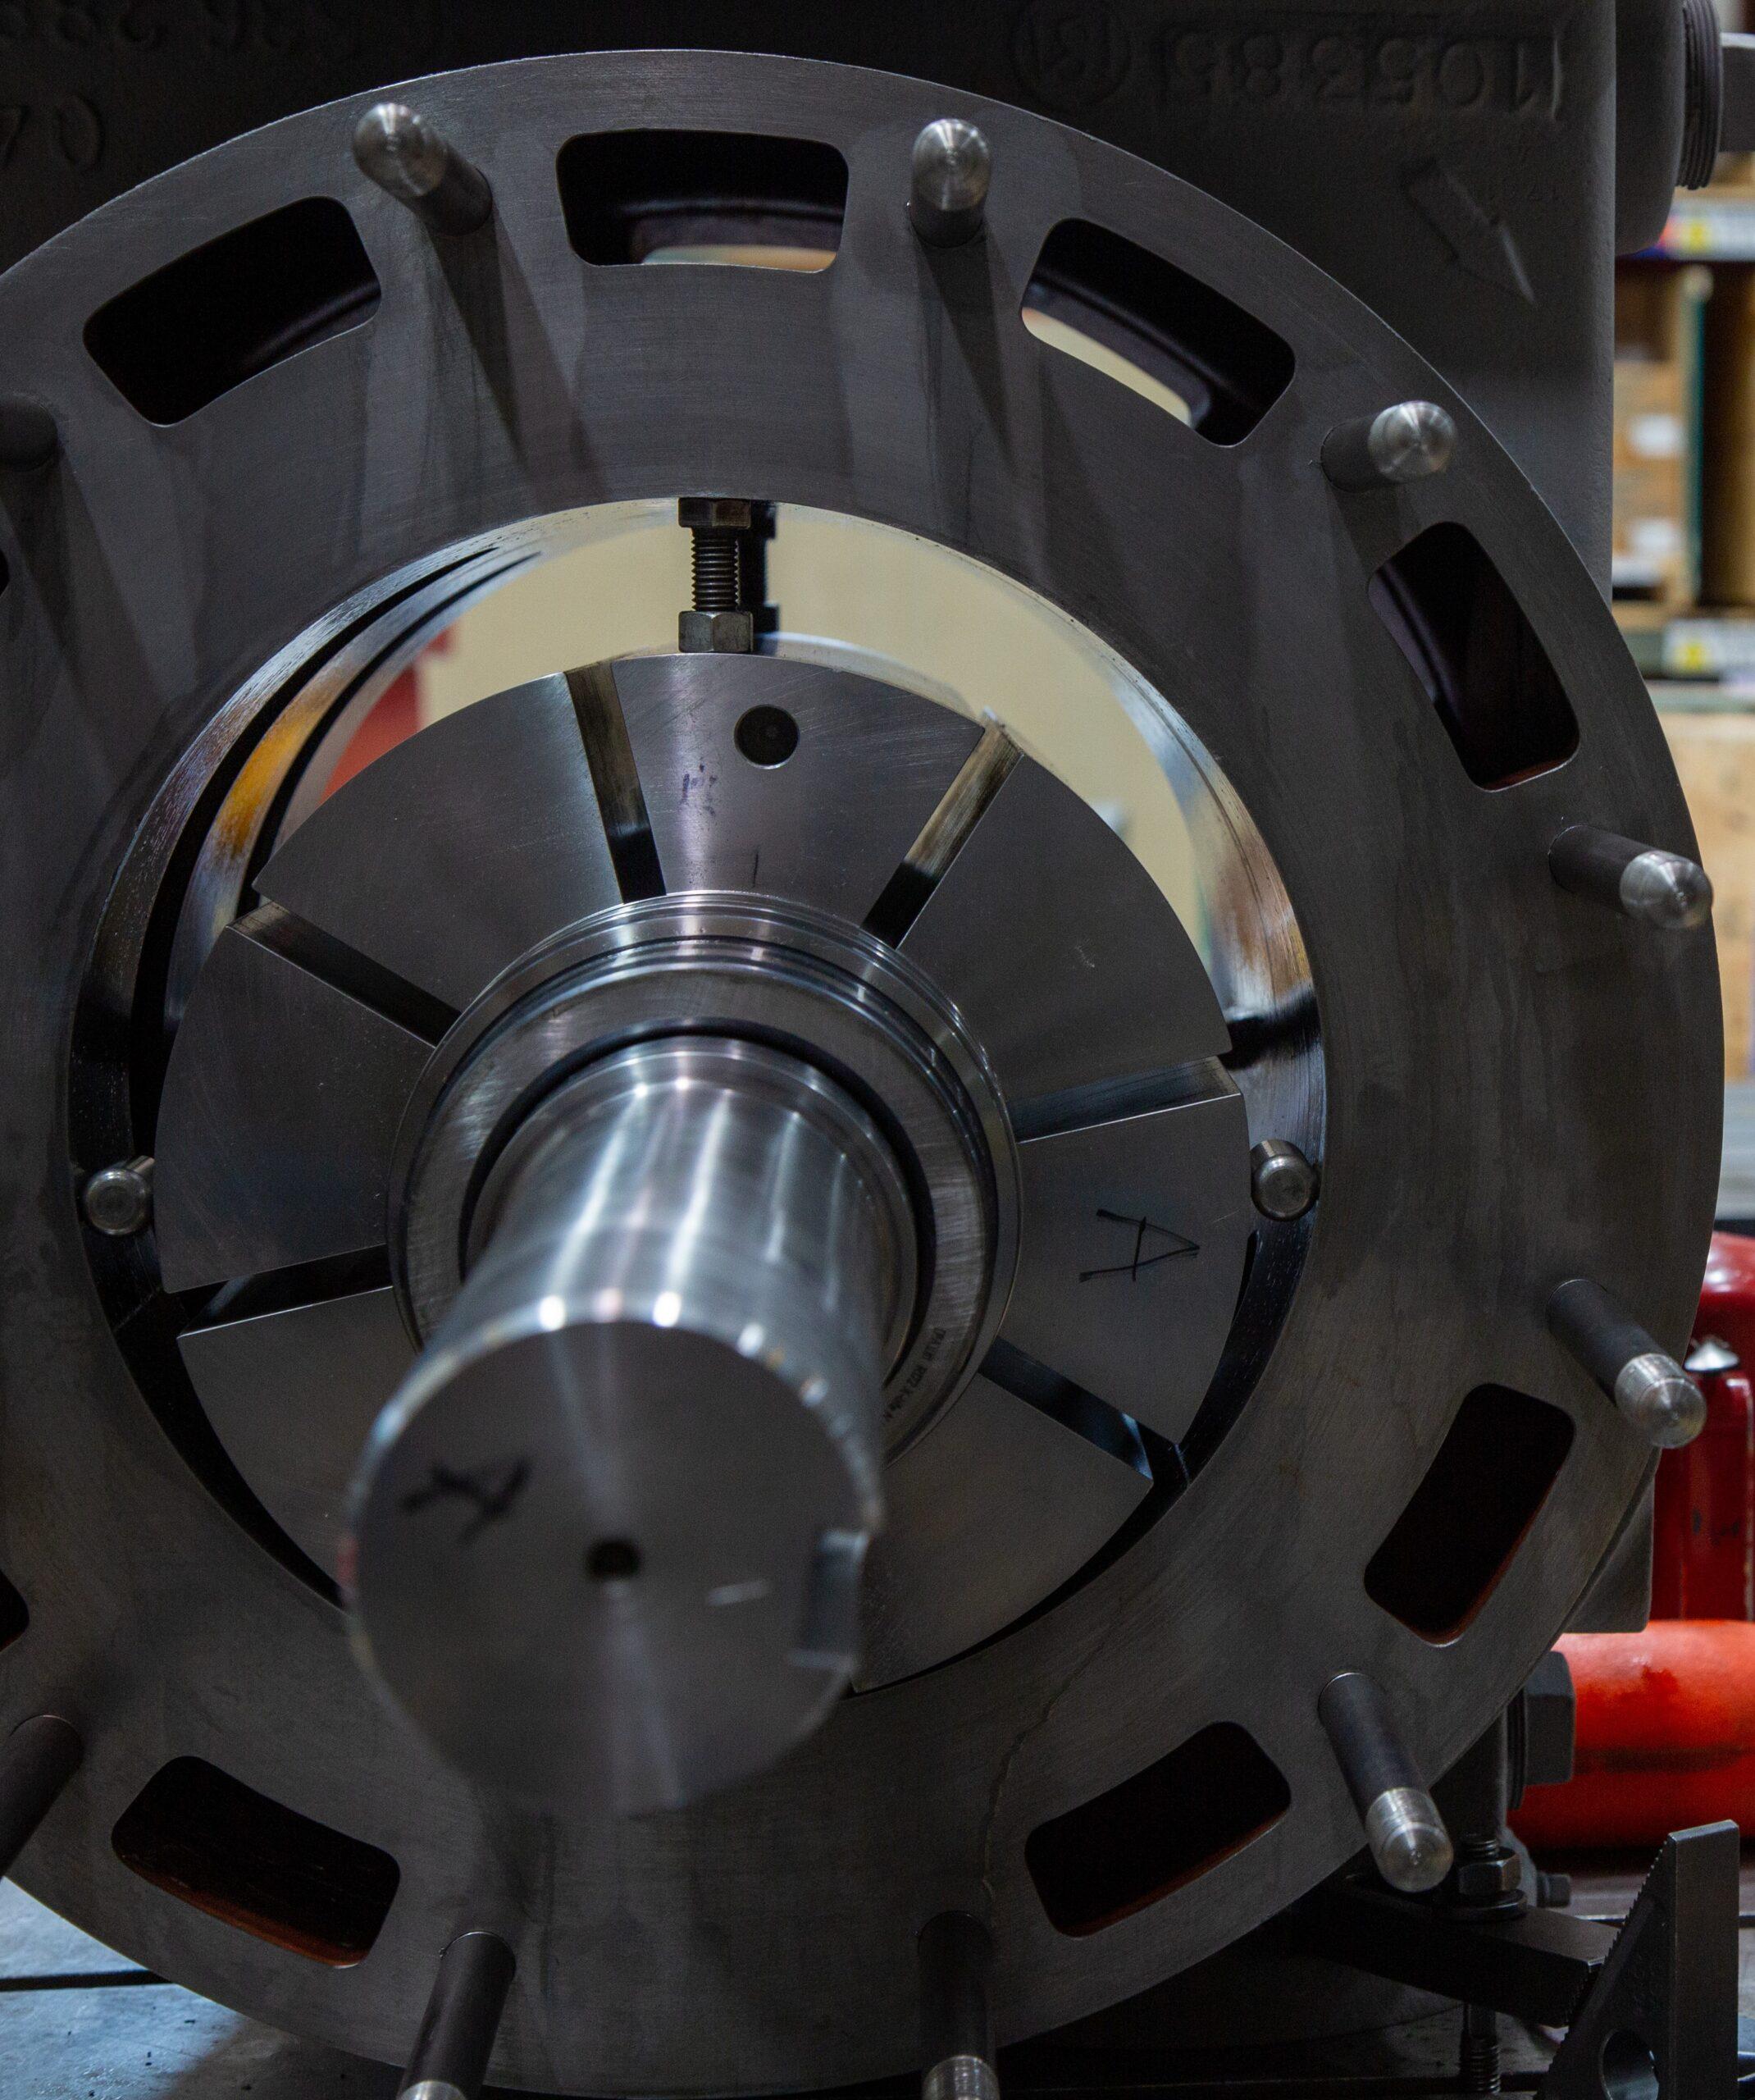 Rotary Vane Compressor FAQs